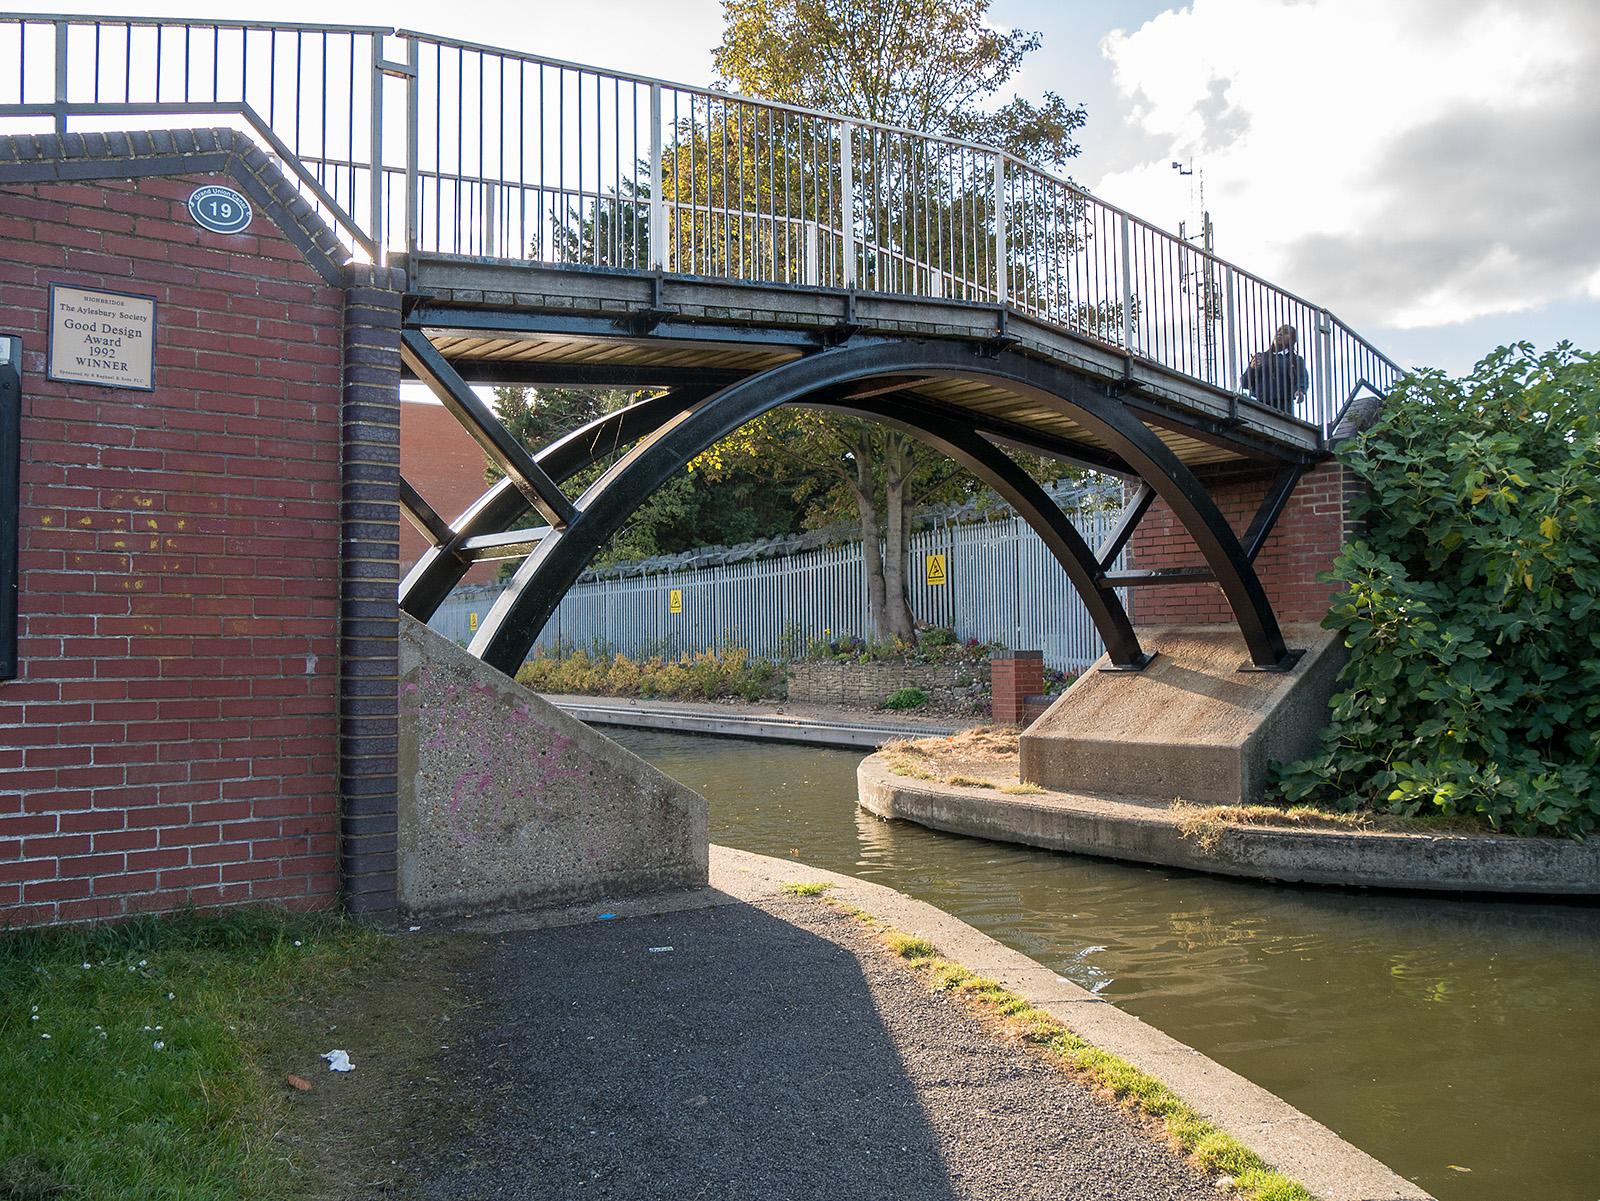 Award winning bridge on the approach to Aylesbury.